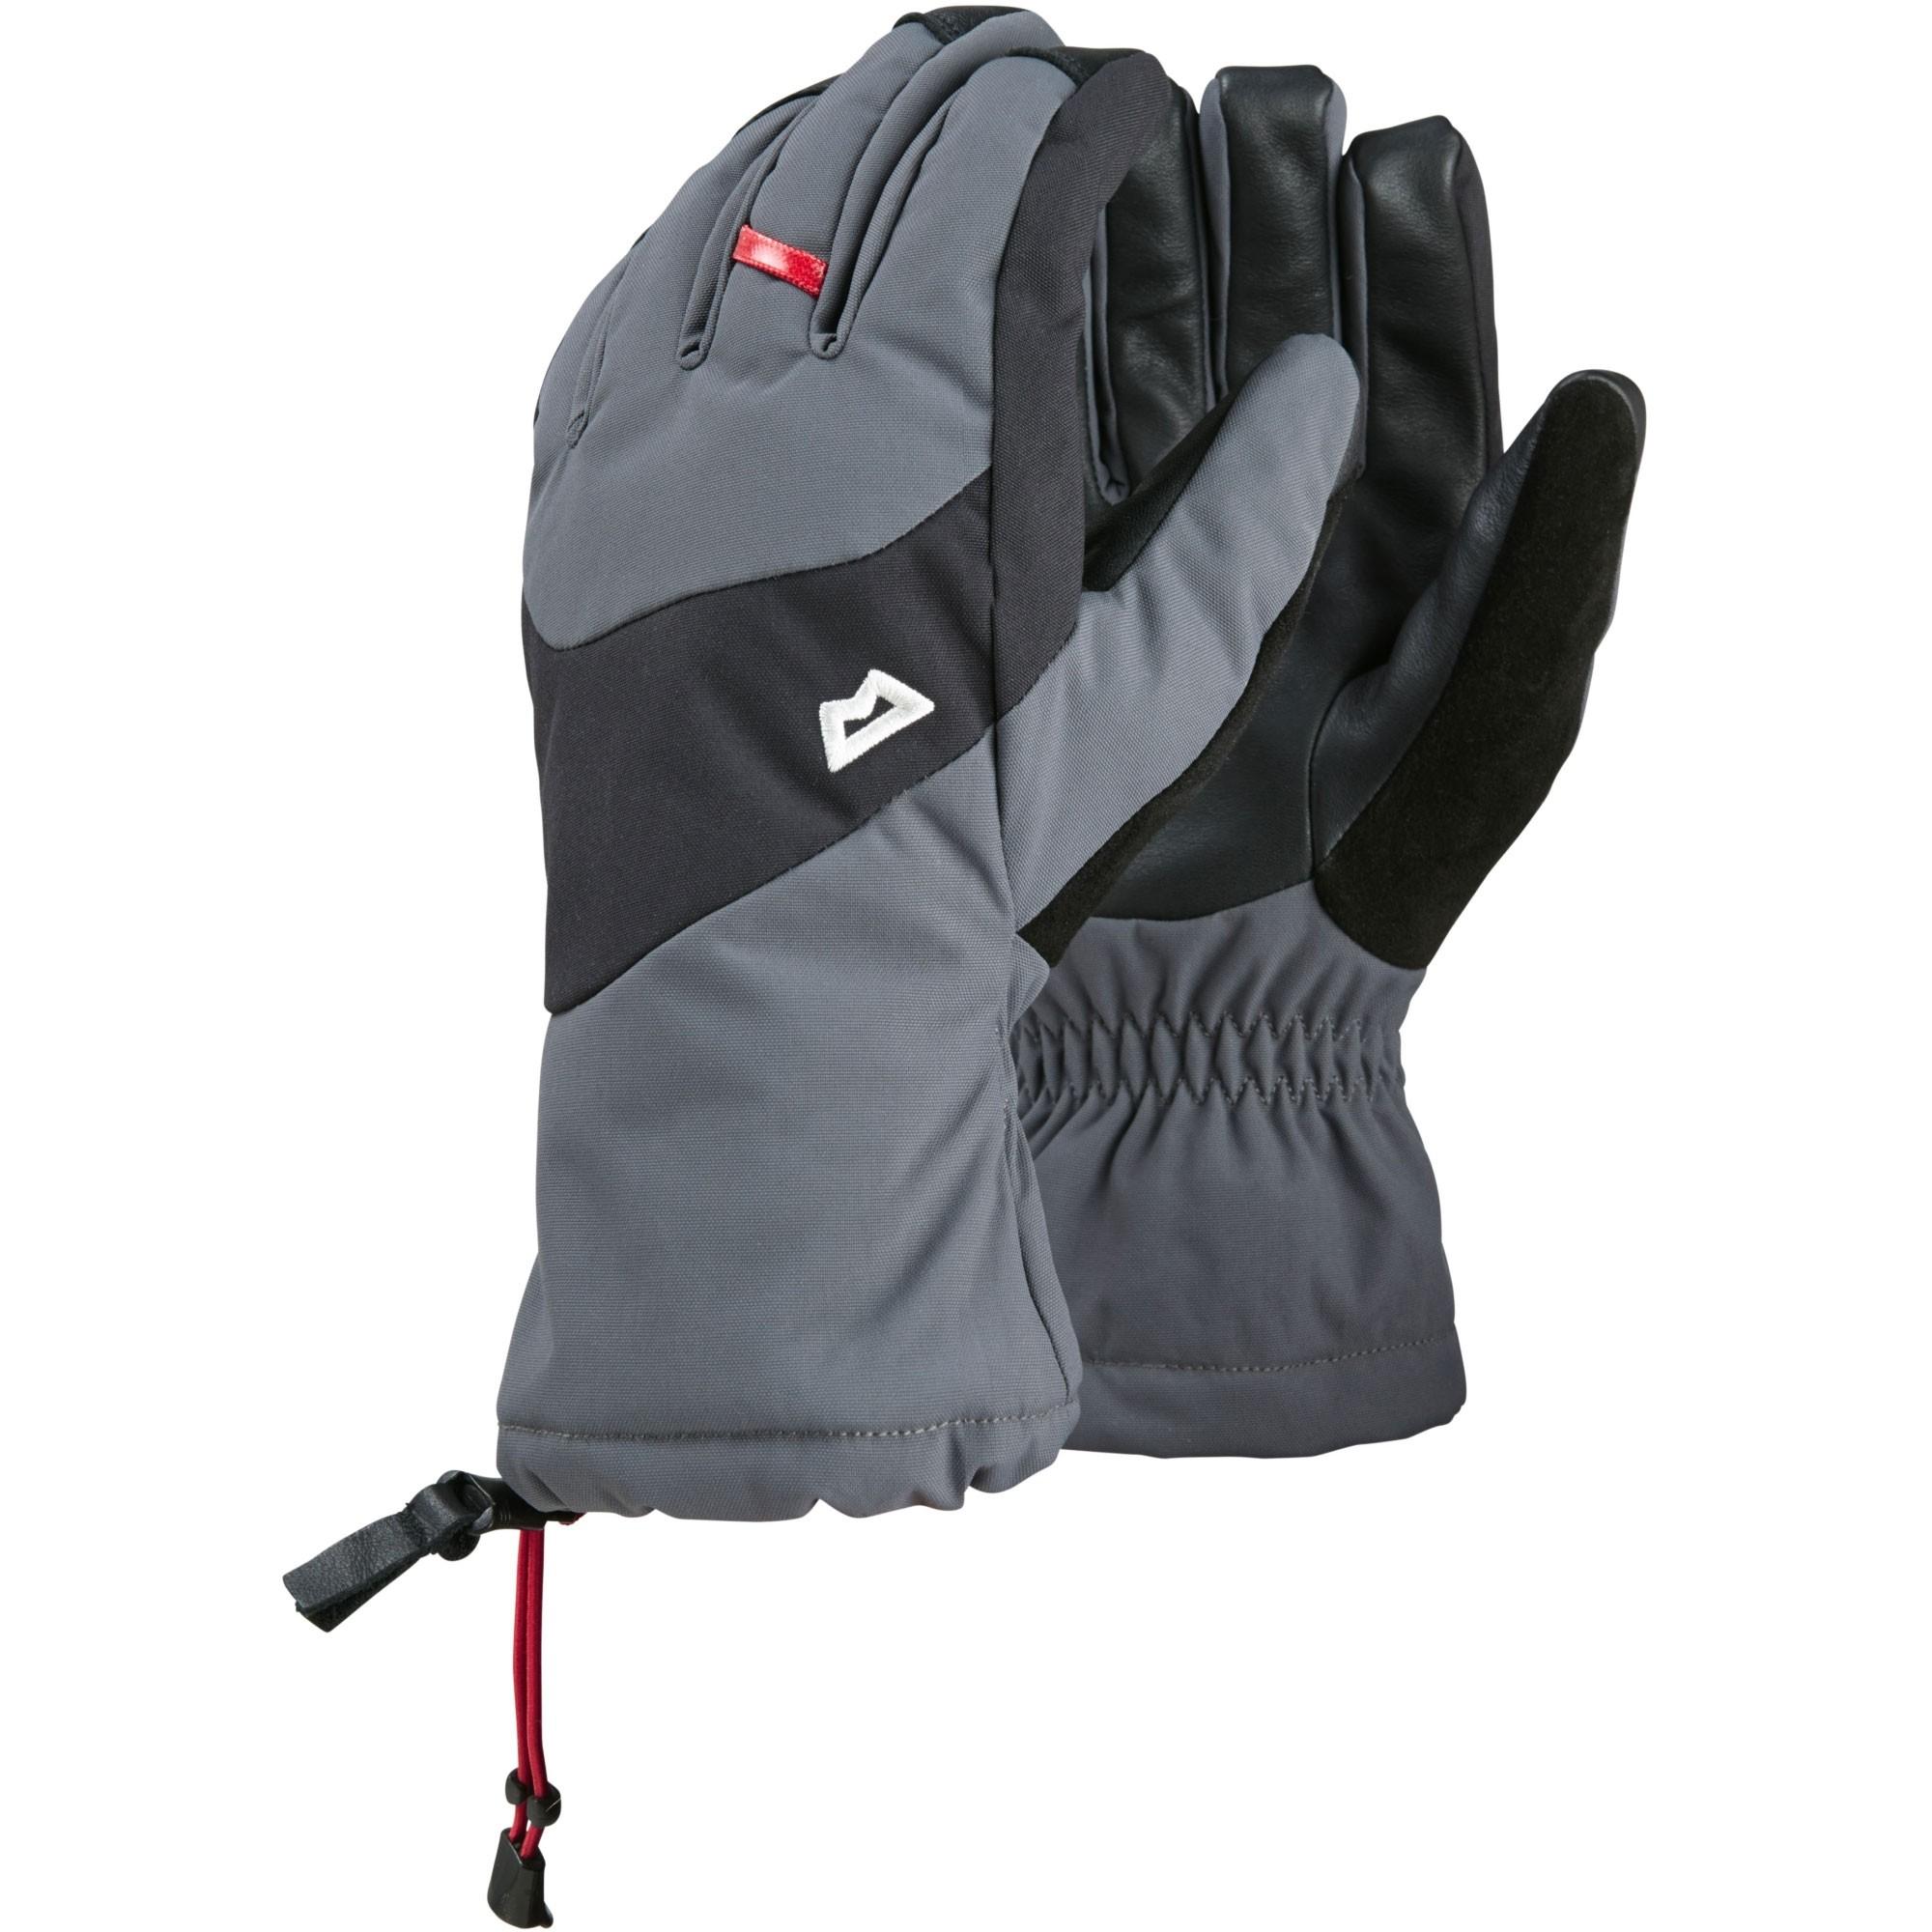 Mountain Equipment Guide Gloves - Shadow Grey/Black